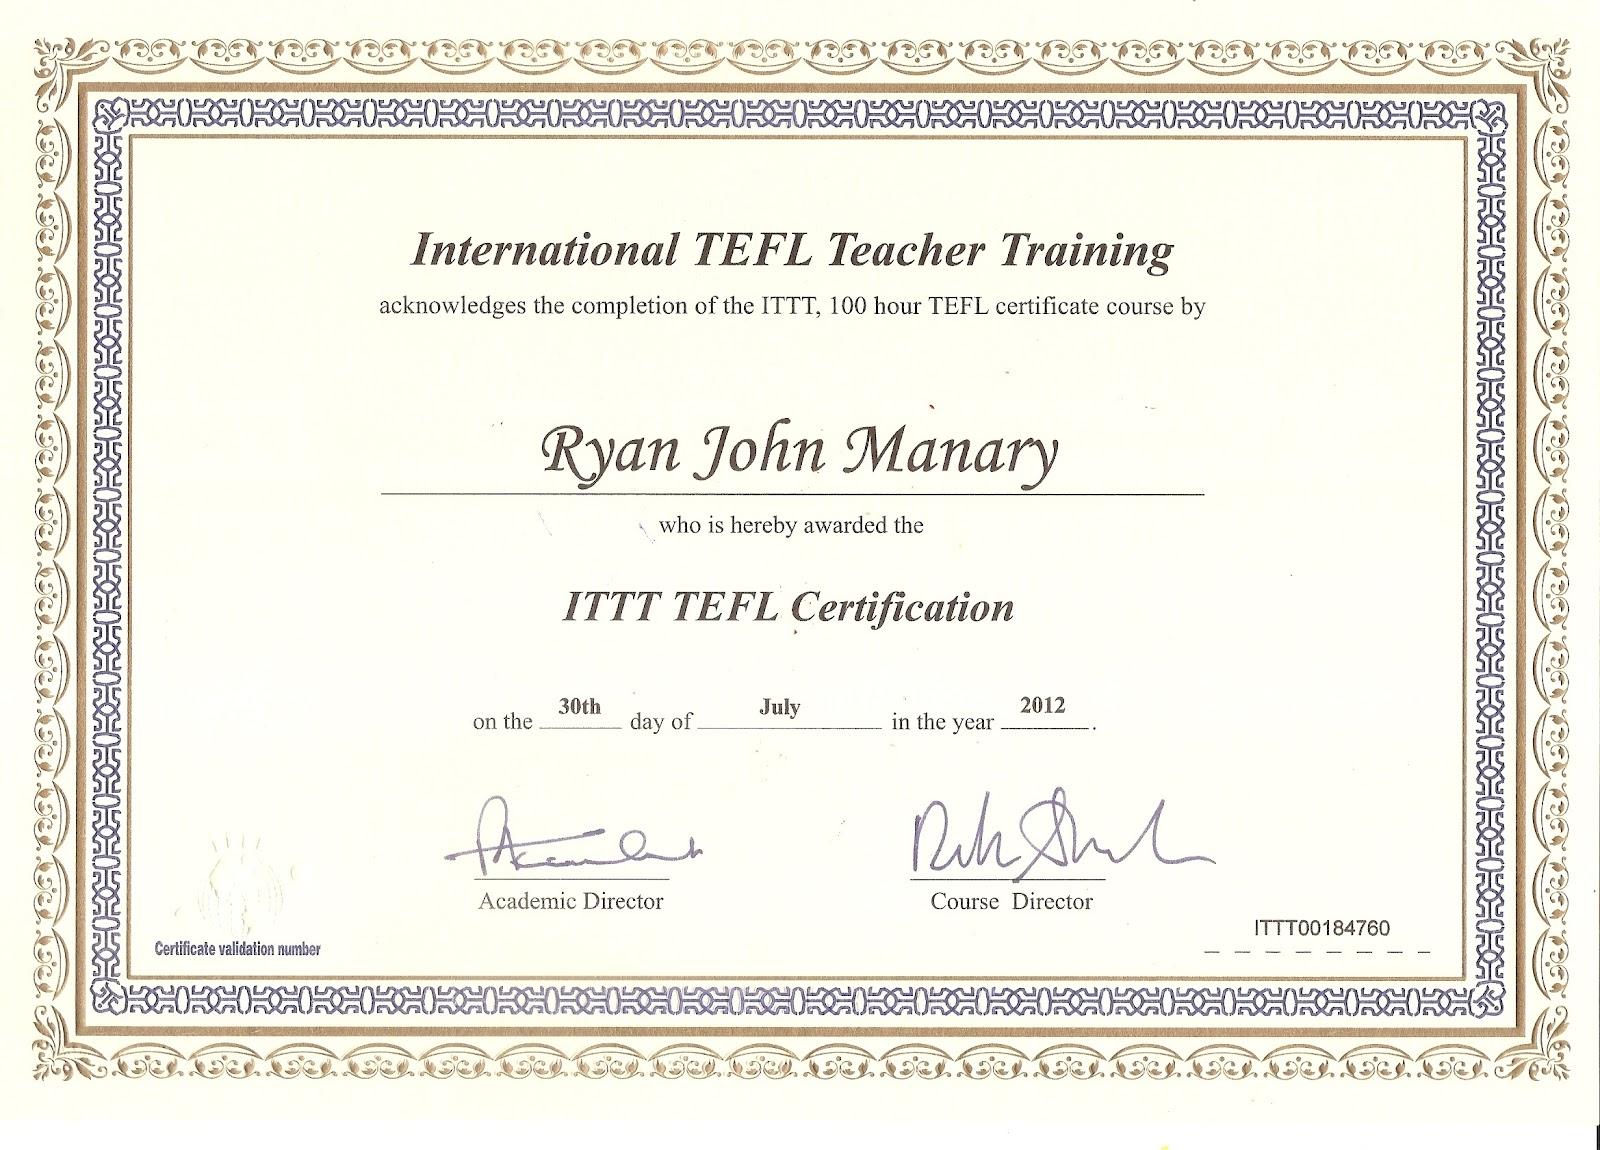 tefl certificate template teaching south esl sample fake korea nice today marks carlynstudio